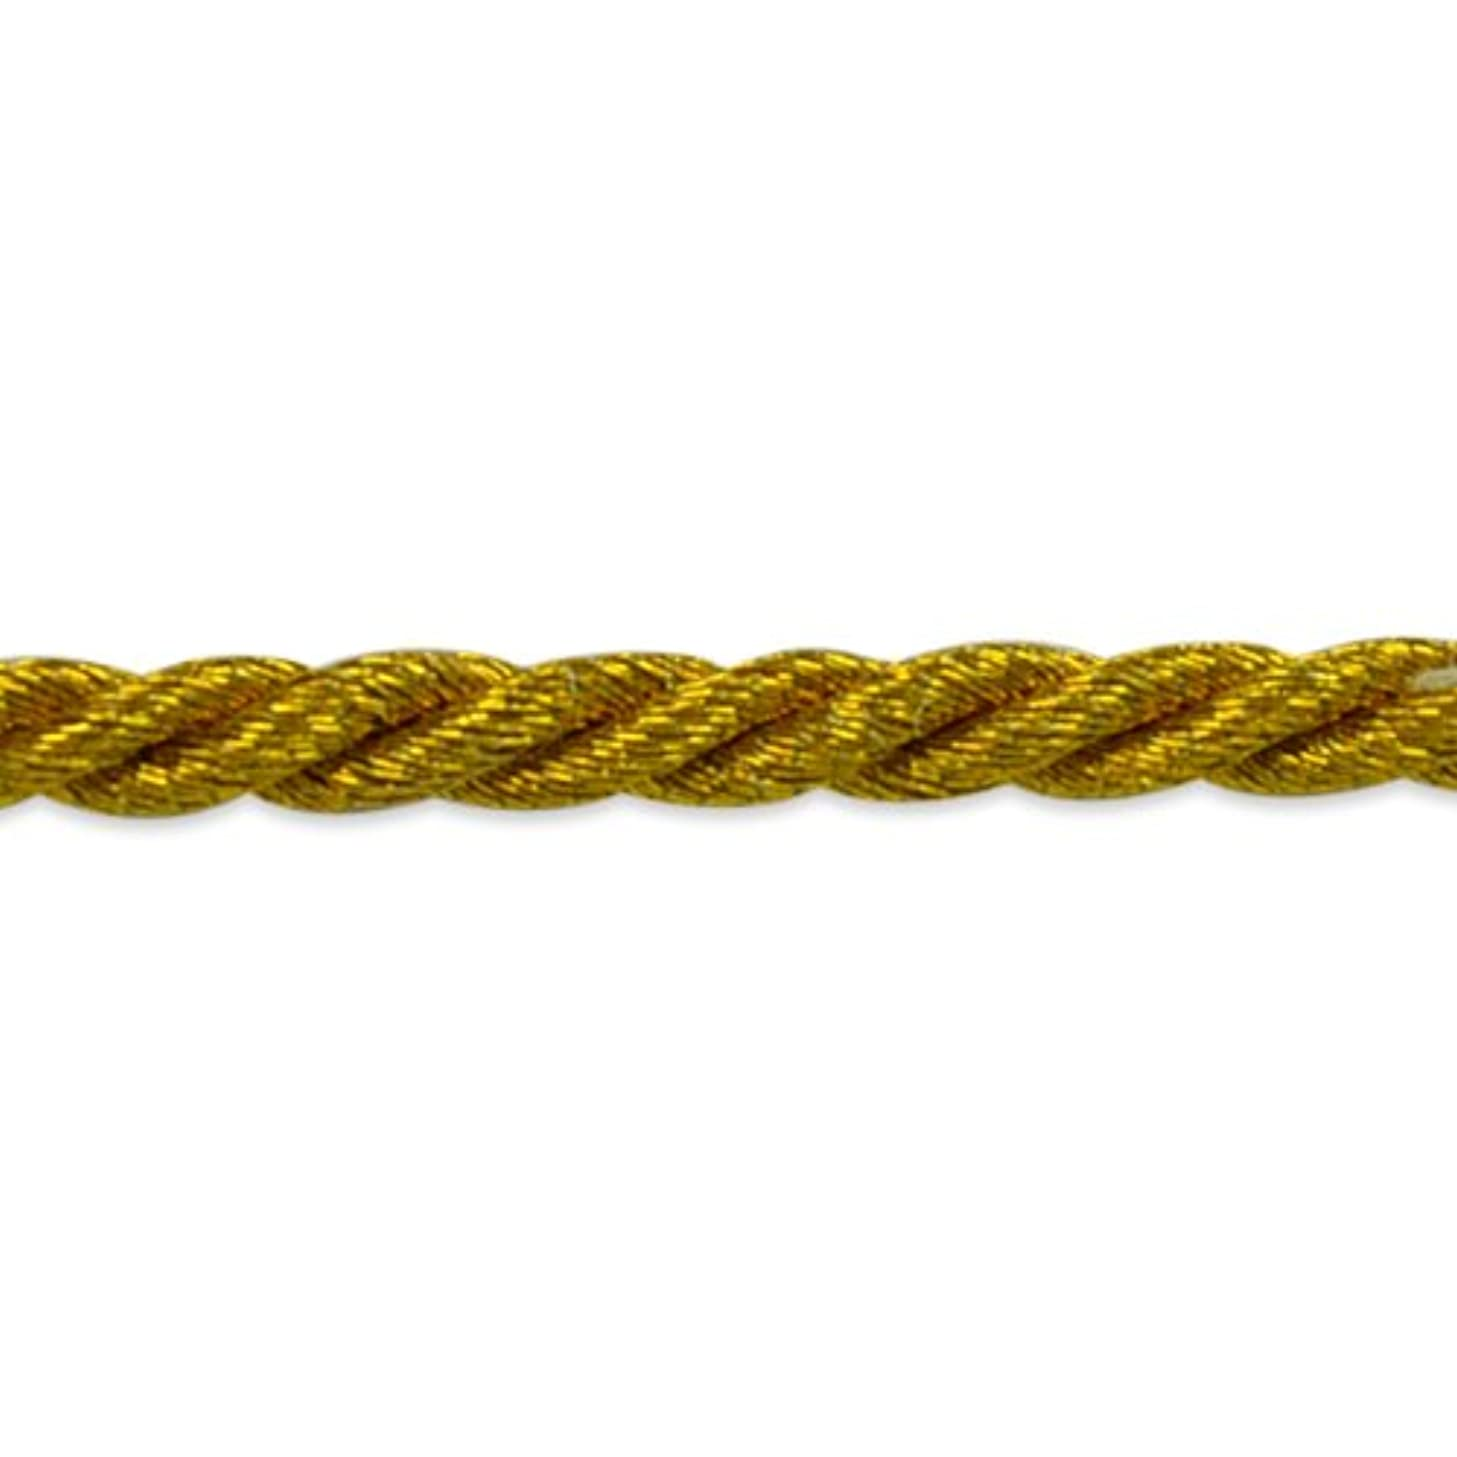 Expo International 20-Yard Phoenix Twisted Cord Trim Embellishment, 1/8-Inch, Antique Gold